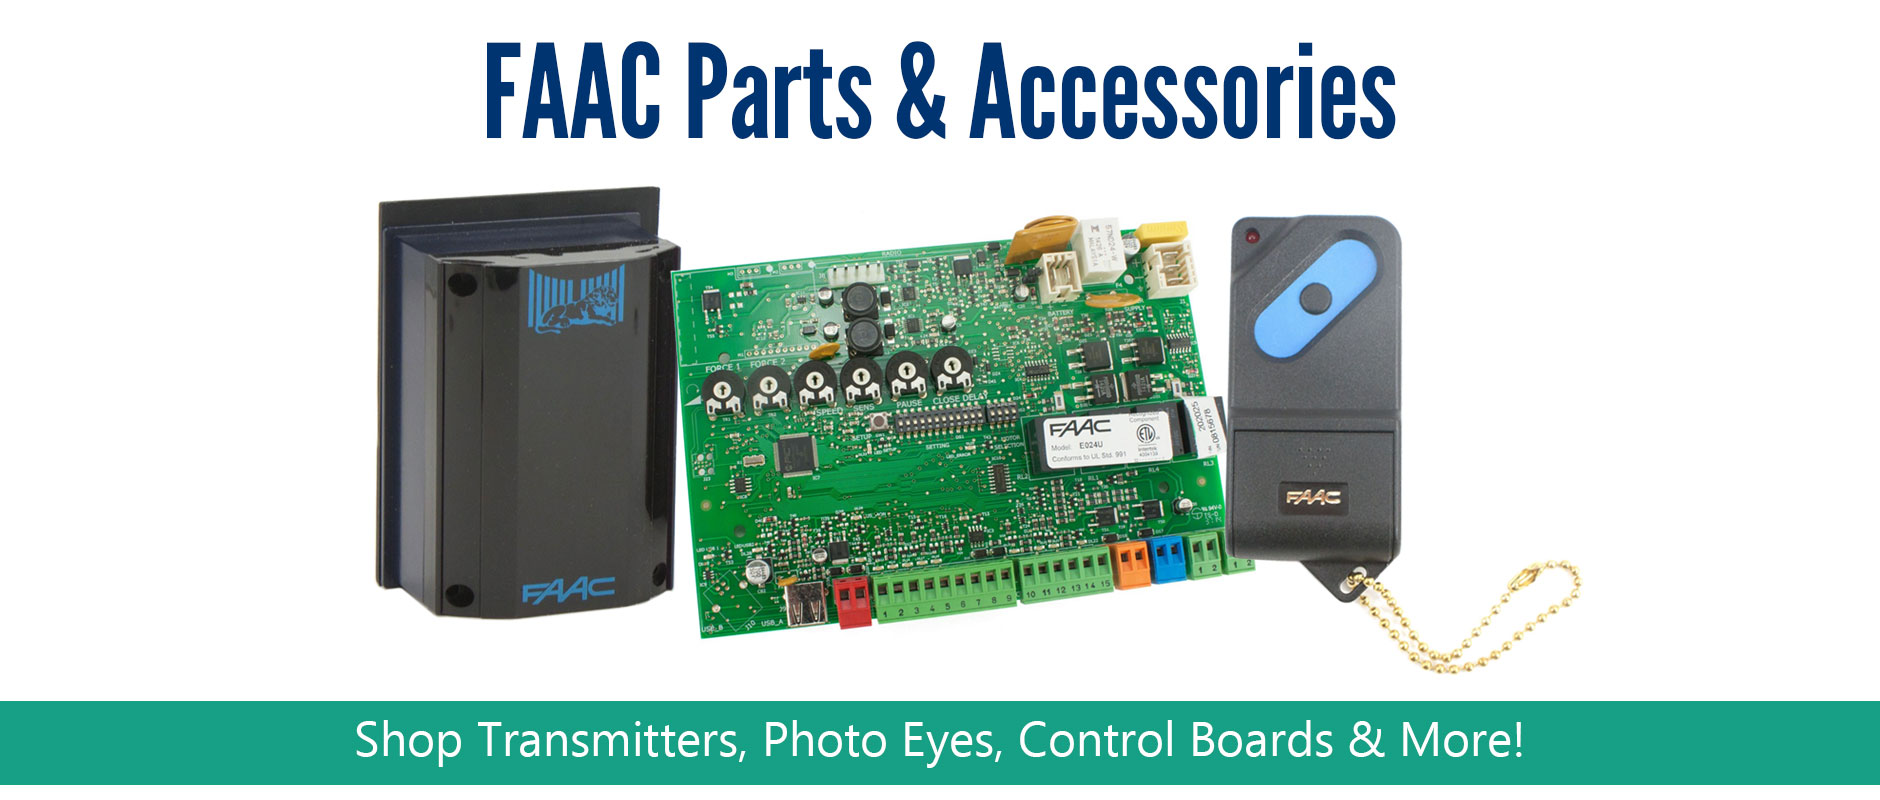 FAAC Accessories